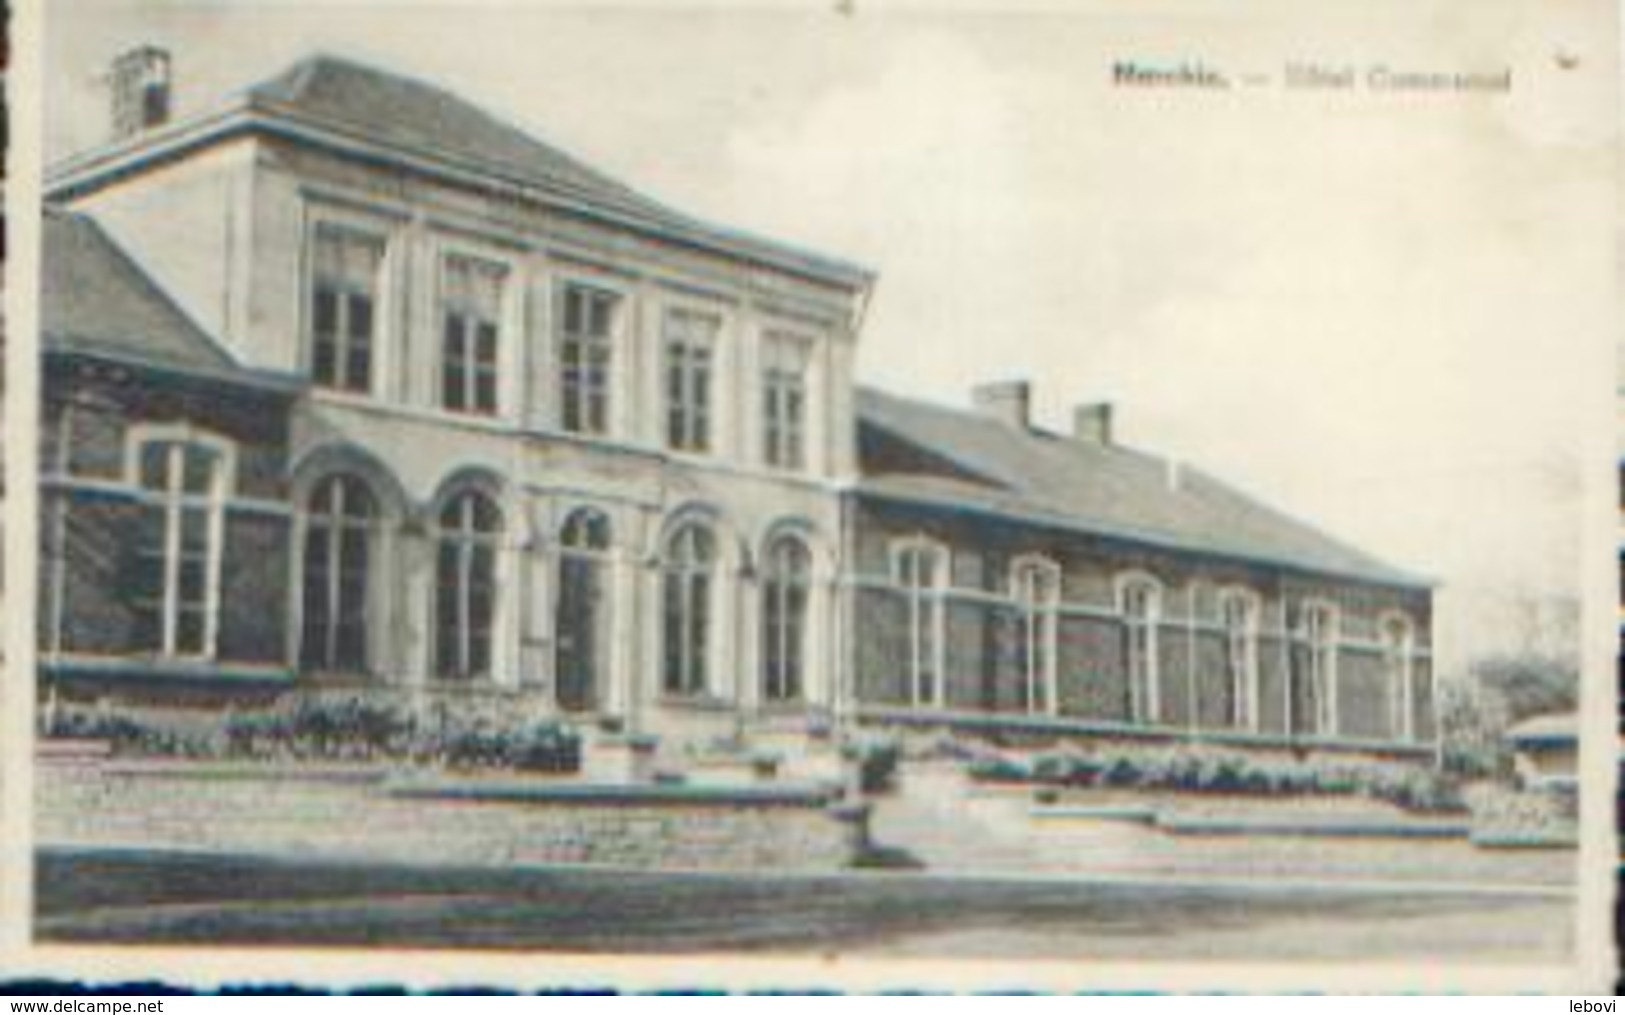 MARCHIN « Hôtel Communal » - Ed. A. Smetz, Saint-Servais - Marchin